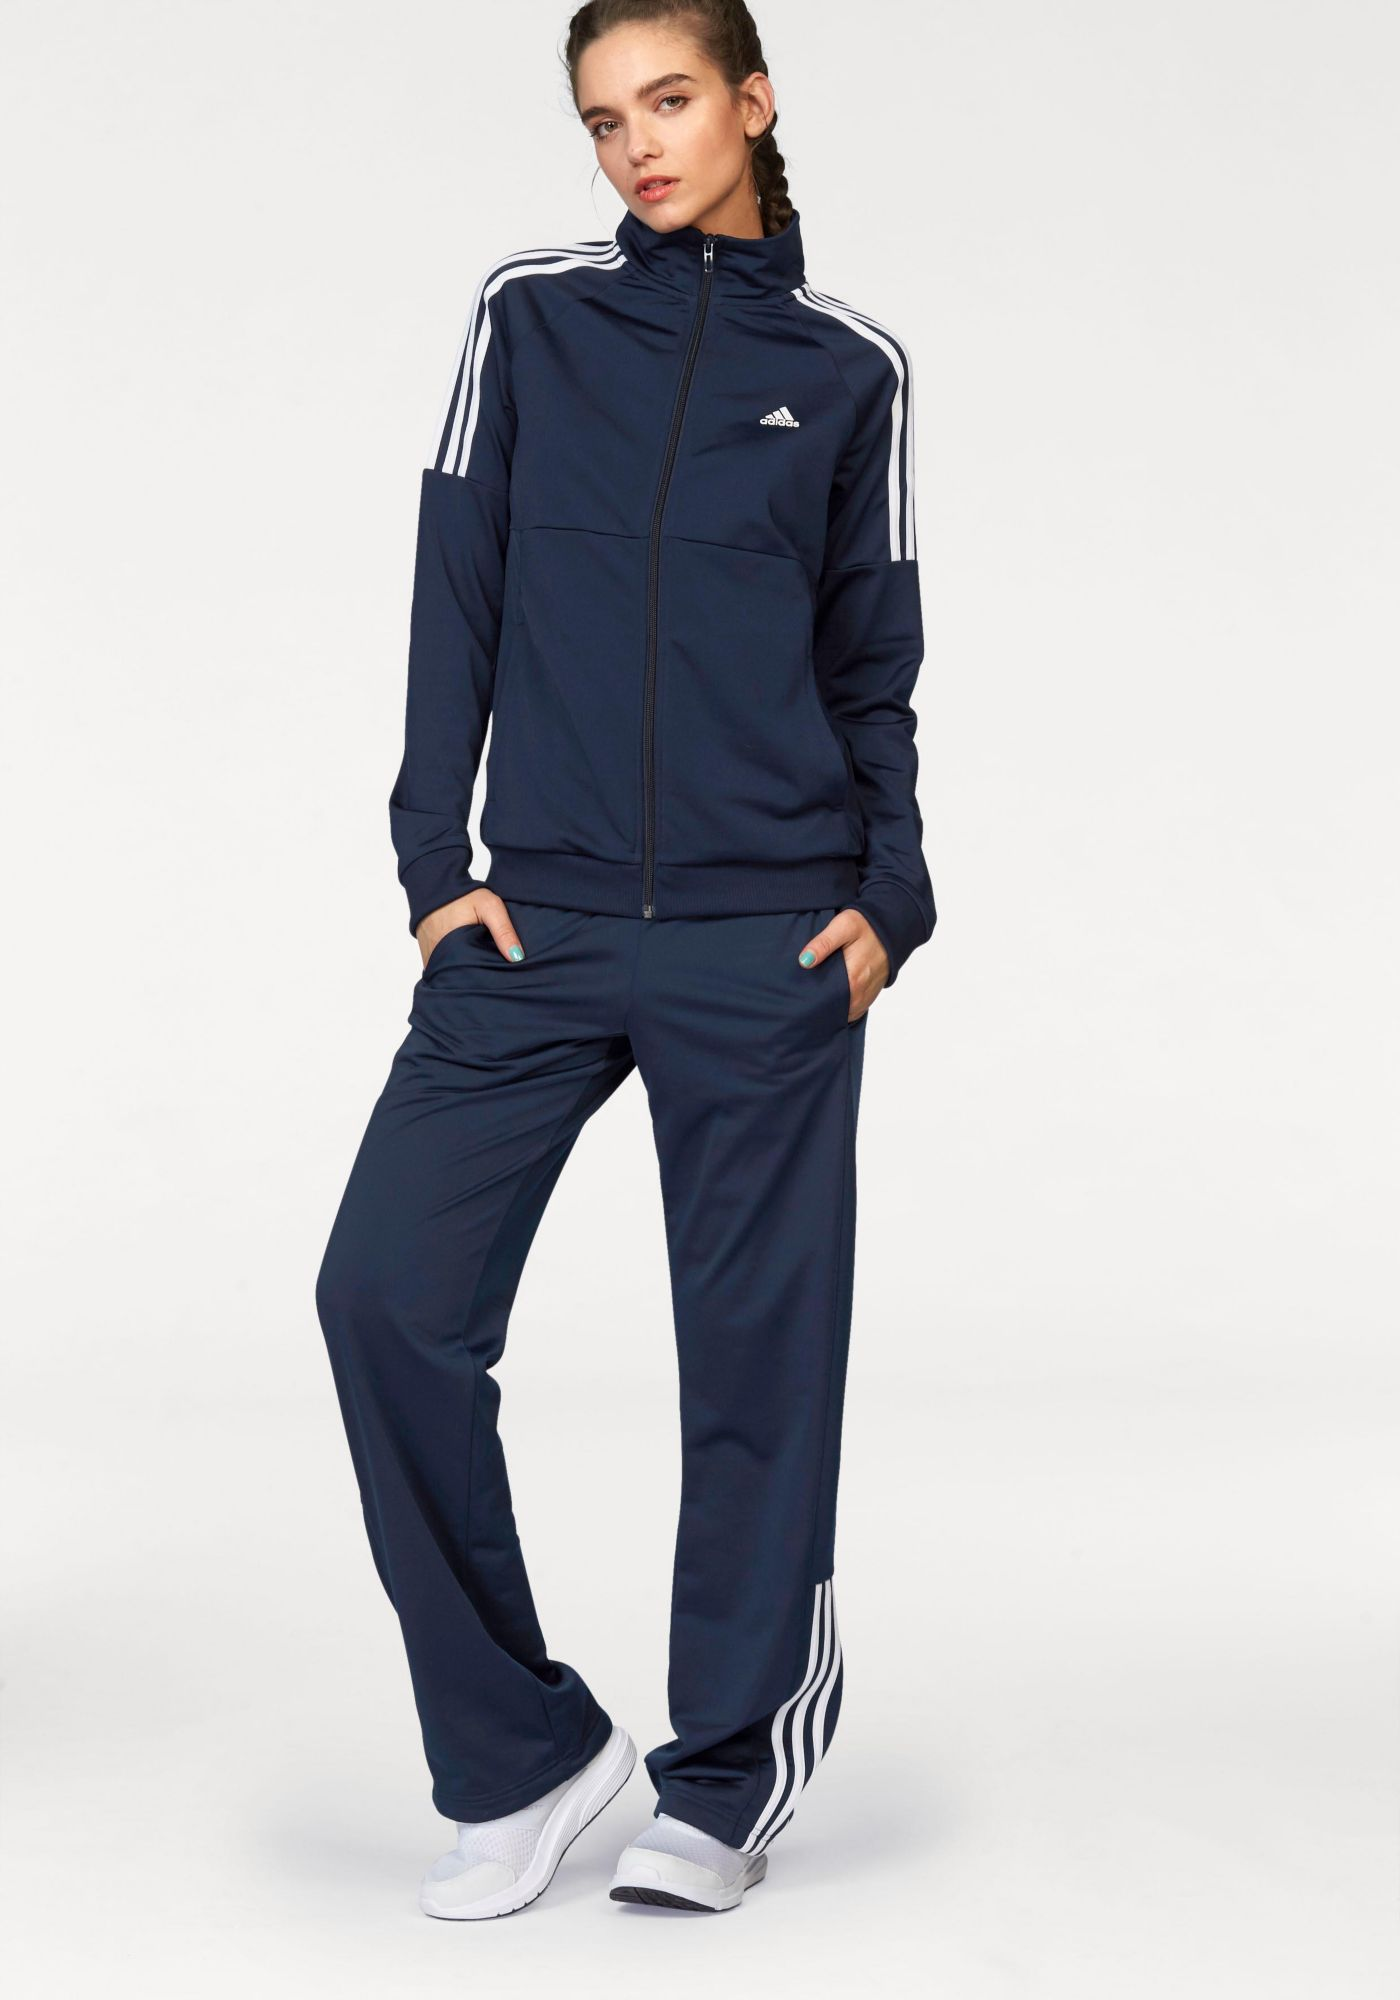 ADIDAS PERFORMANCE adidas Performance Trainingsanzug »FRIEDA SUIT«